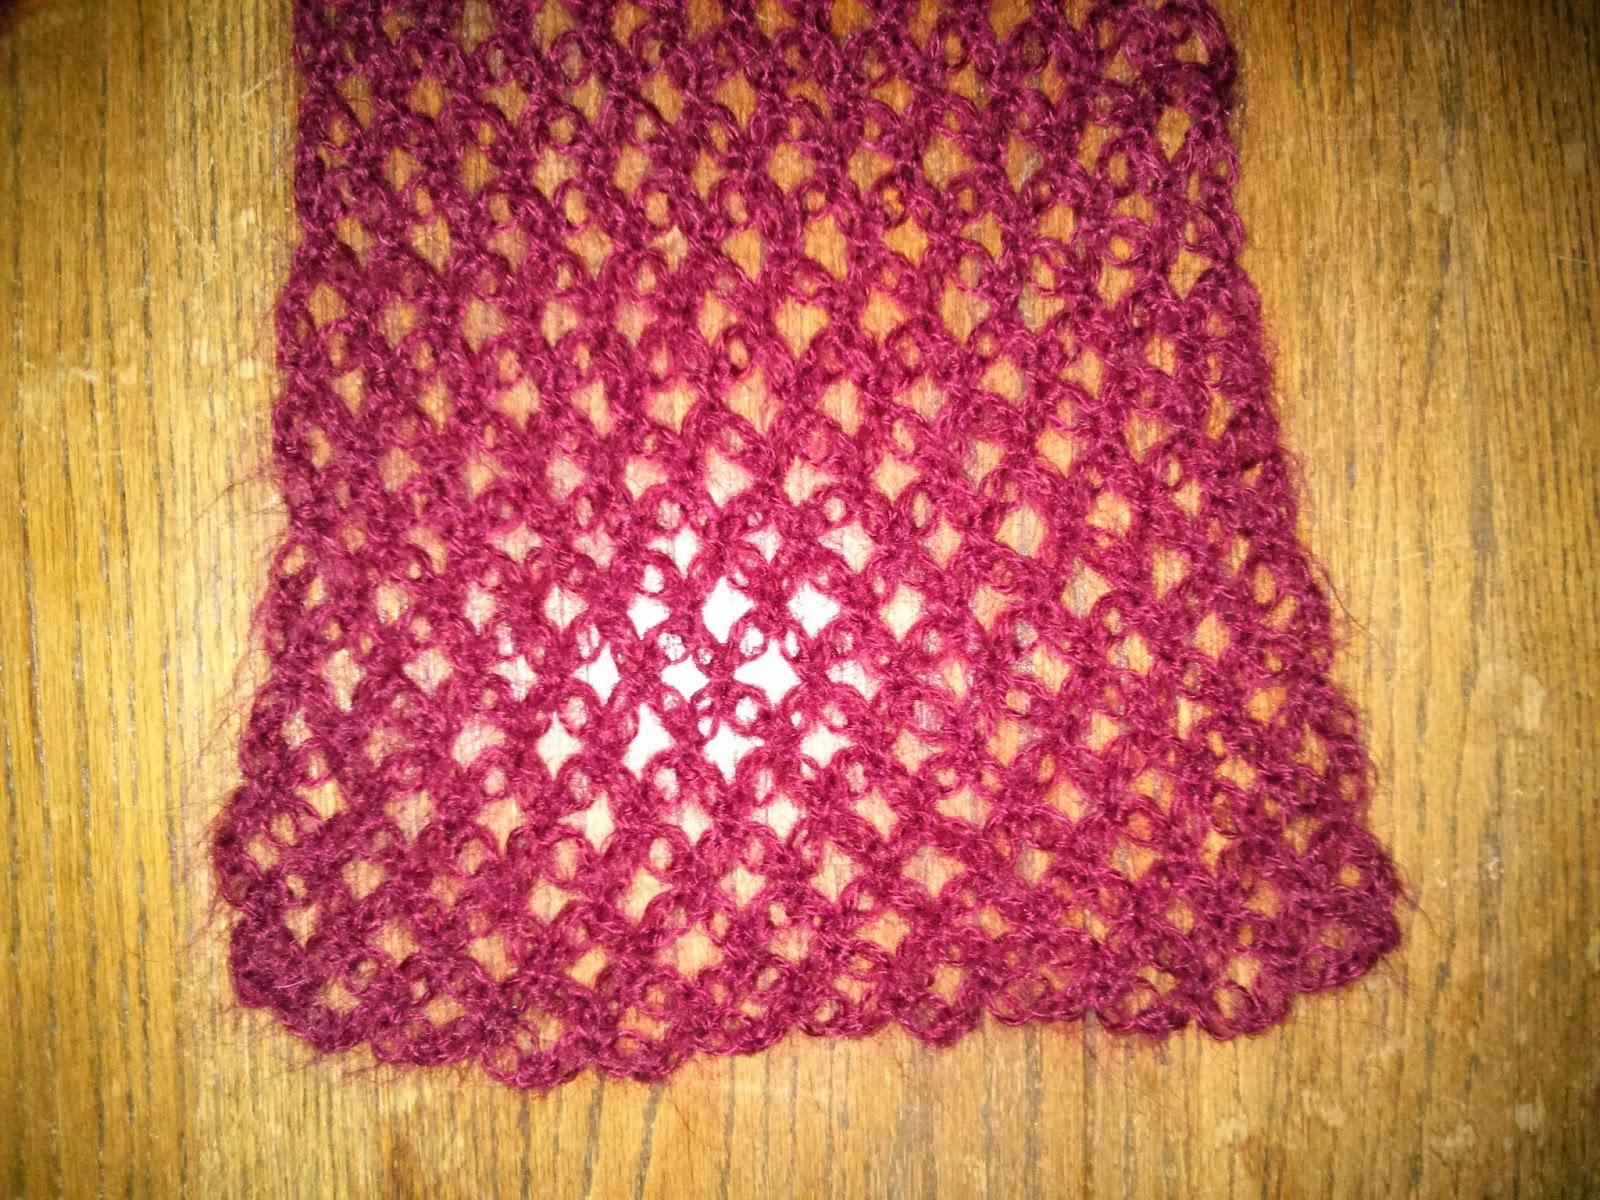 Mis cositas de punto bufanda de lana a ganchillo nudo salom n - Puntos de lana ...